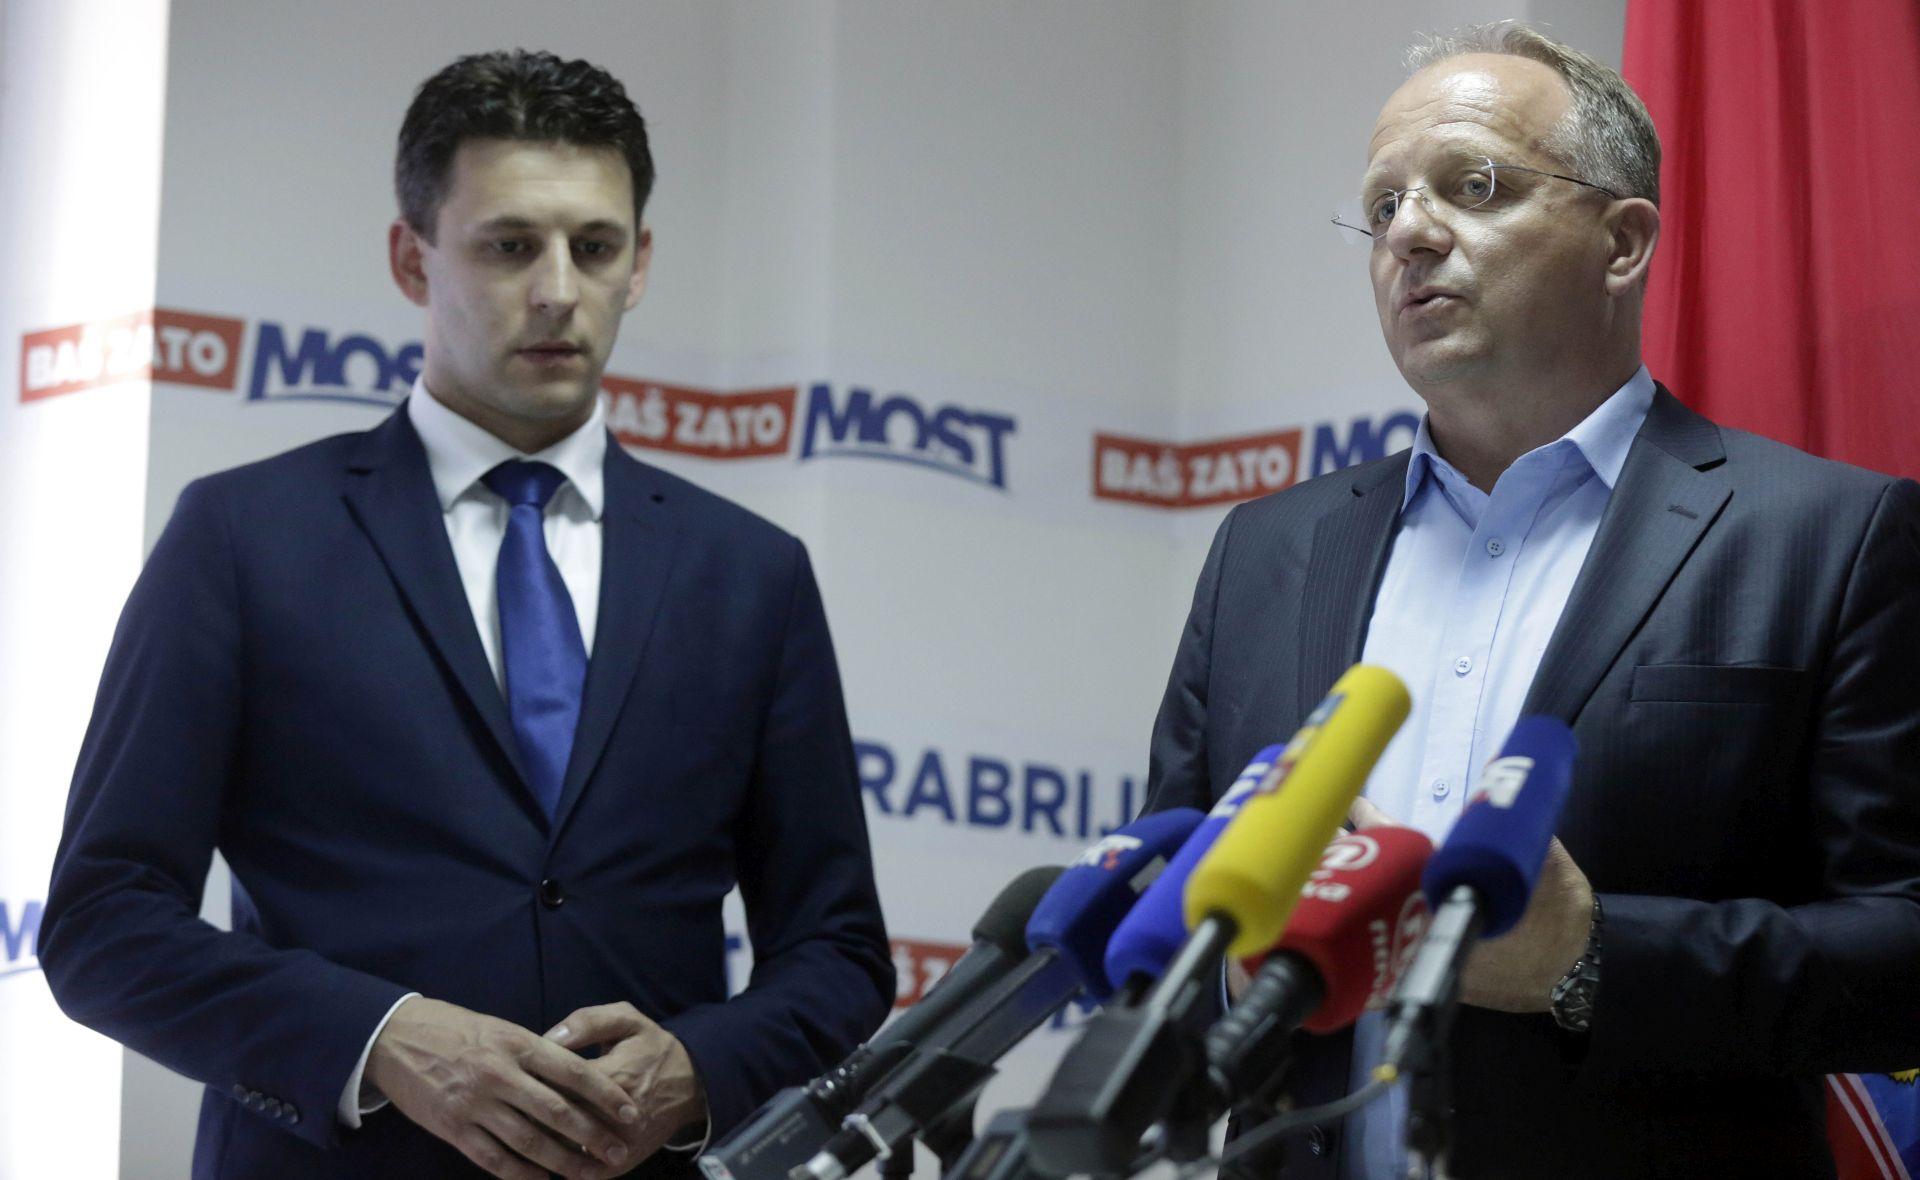 NOVI ČLAN: MOST-u se pridružio i gradonačelnik Novalje, nezavisni Ante Dabo